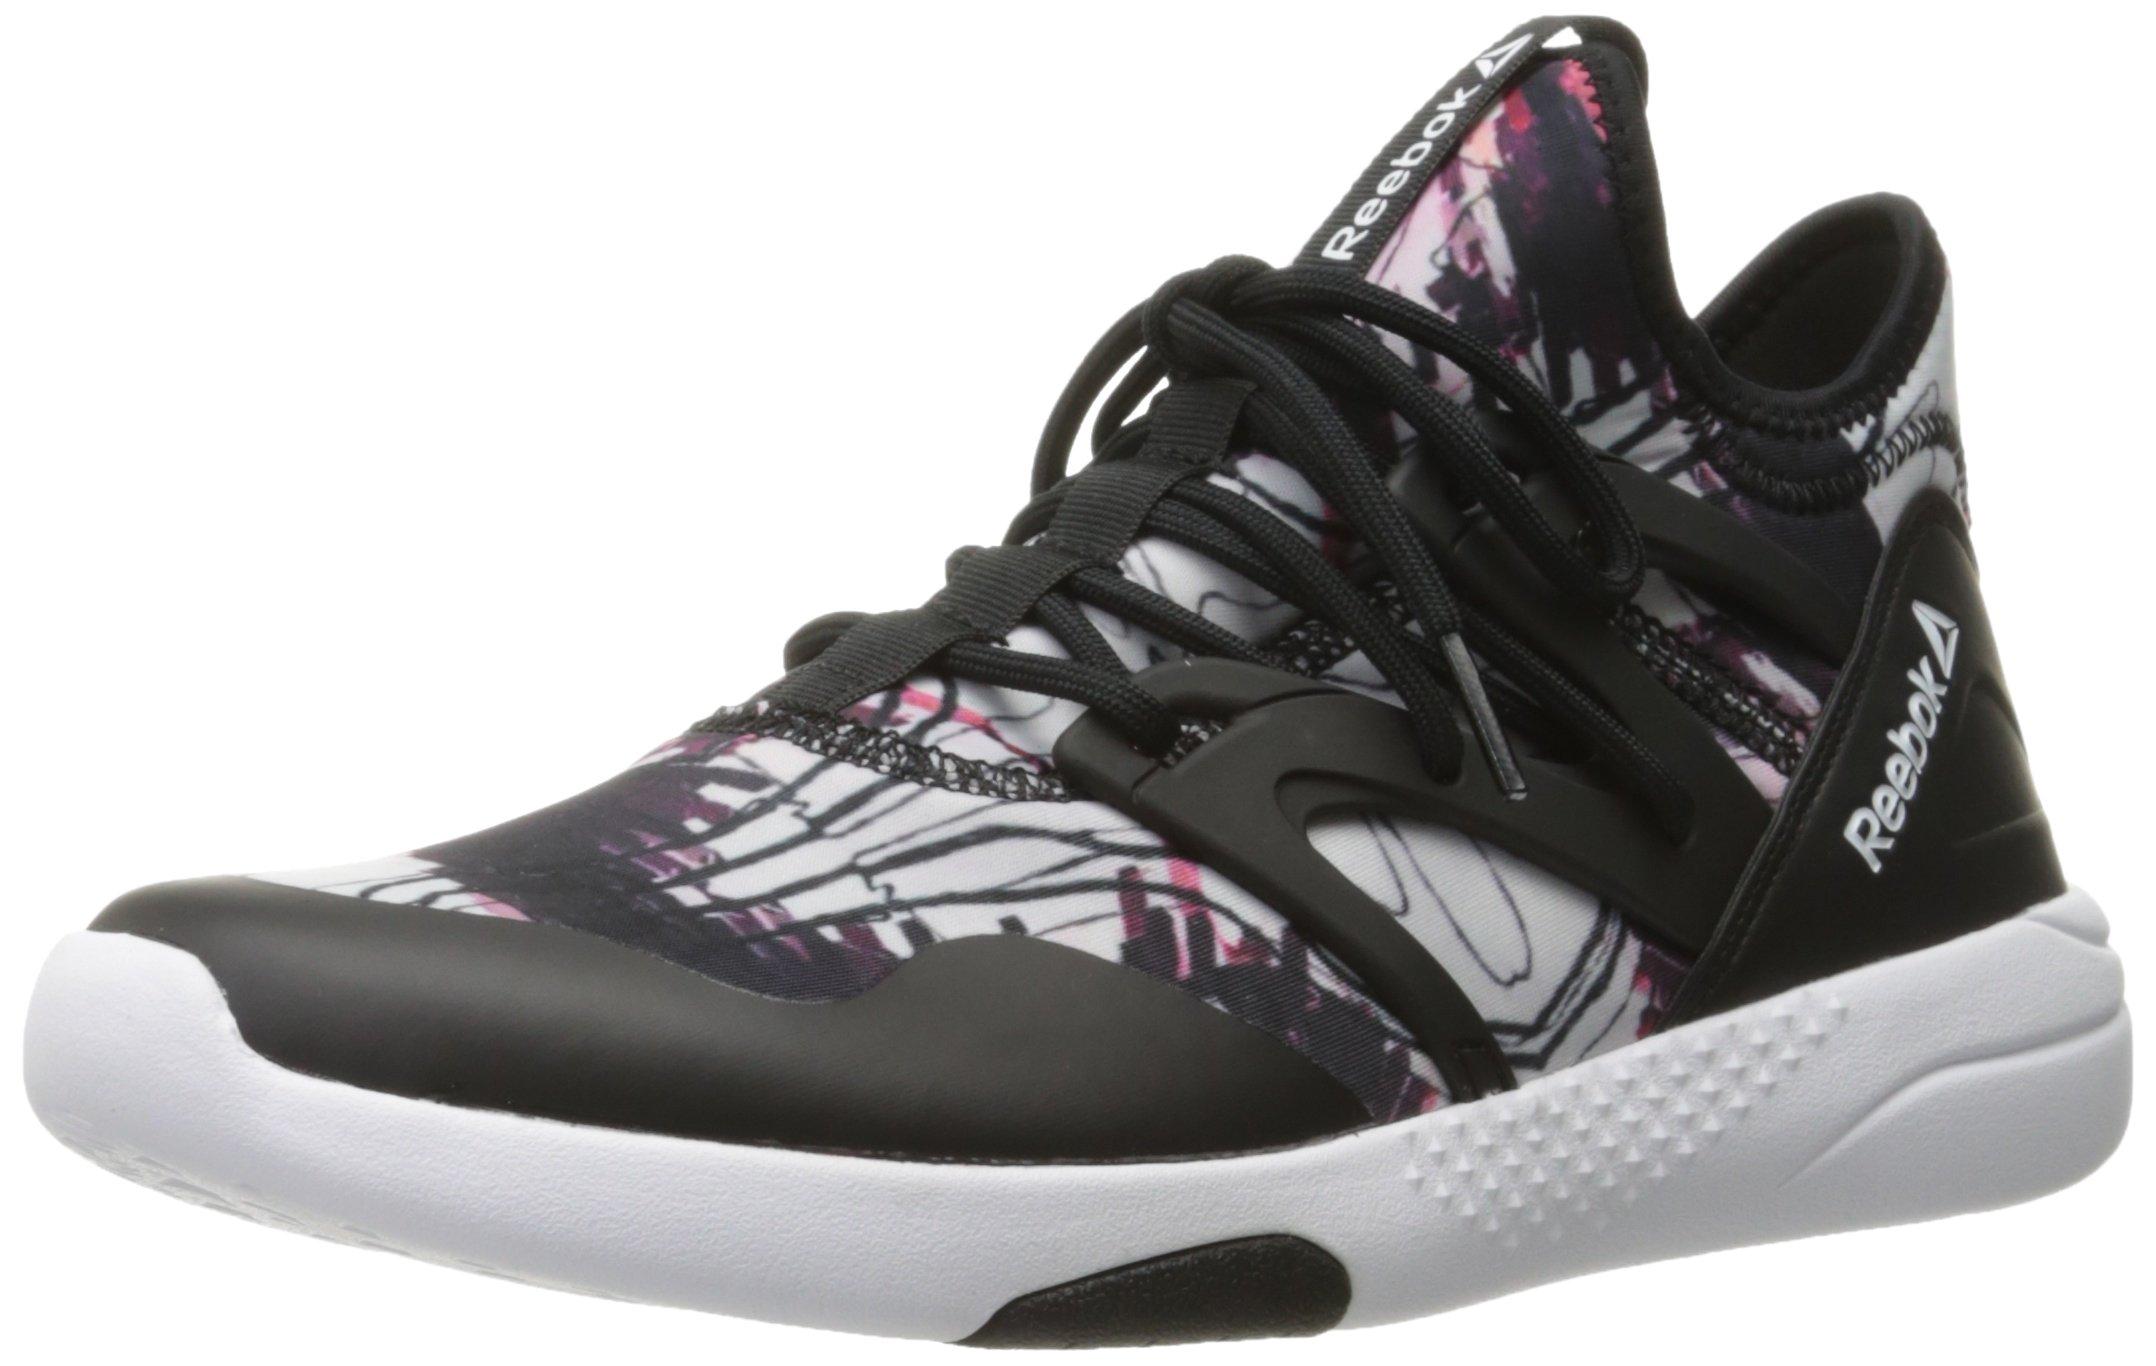 Reebok Women's Hayasu Dance Shoes, Graphic Black/White, 8 M US